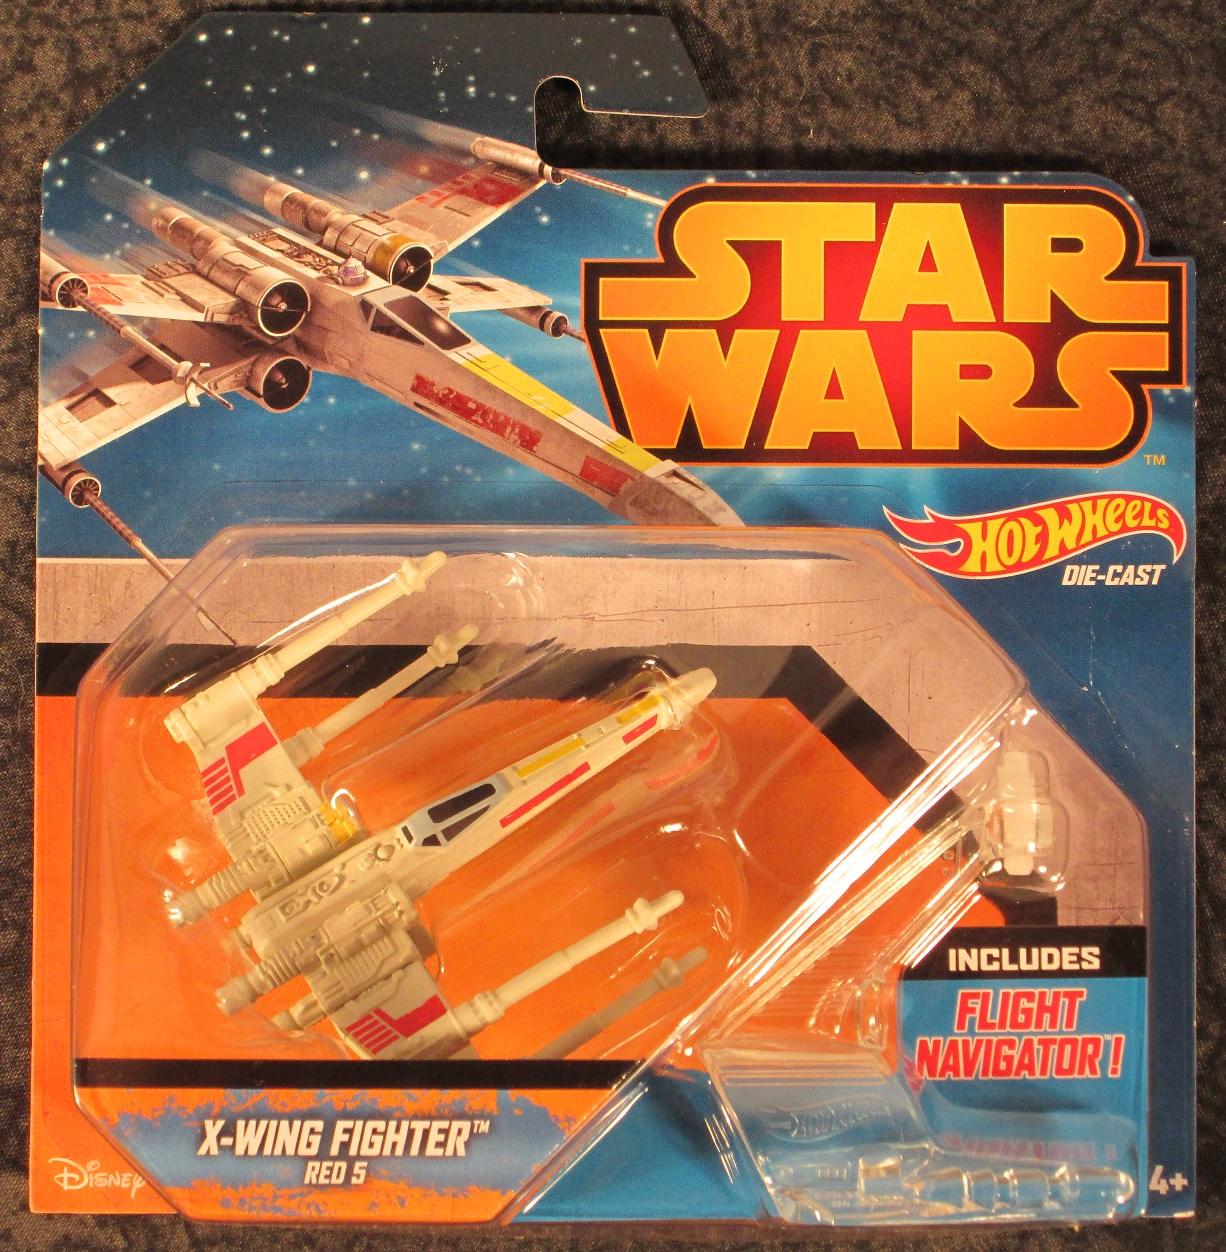 for sale online Hot Wheels 2021 Star Wars Starships Jedi Starfighter New